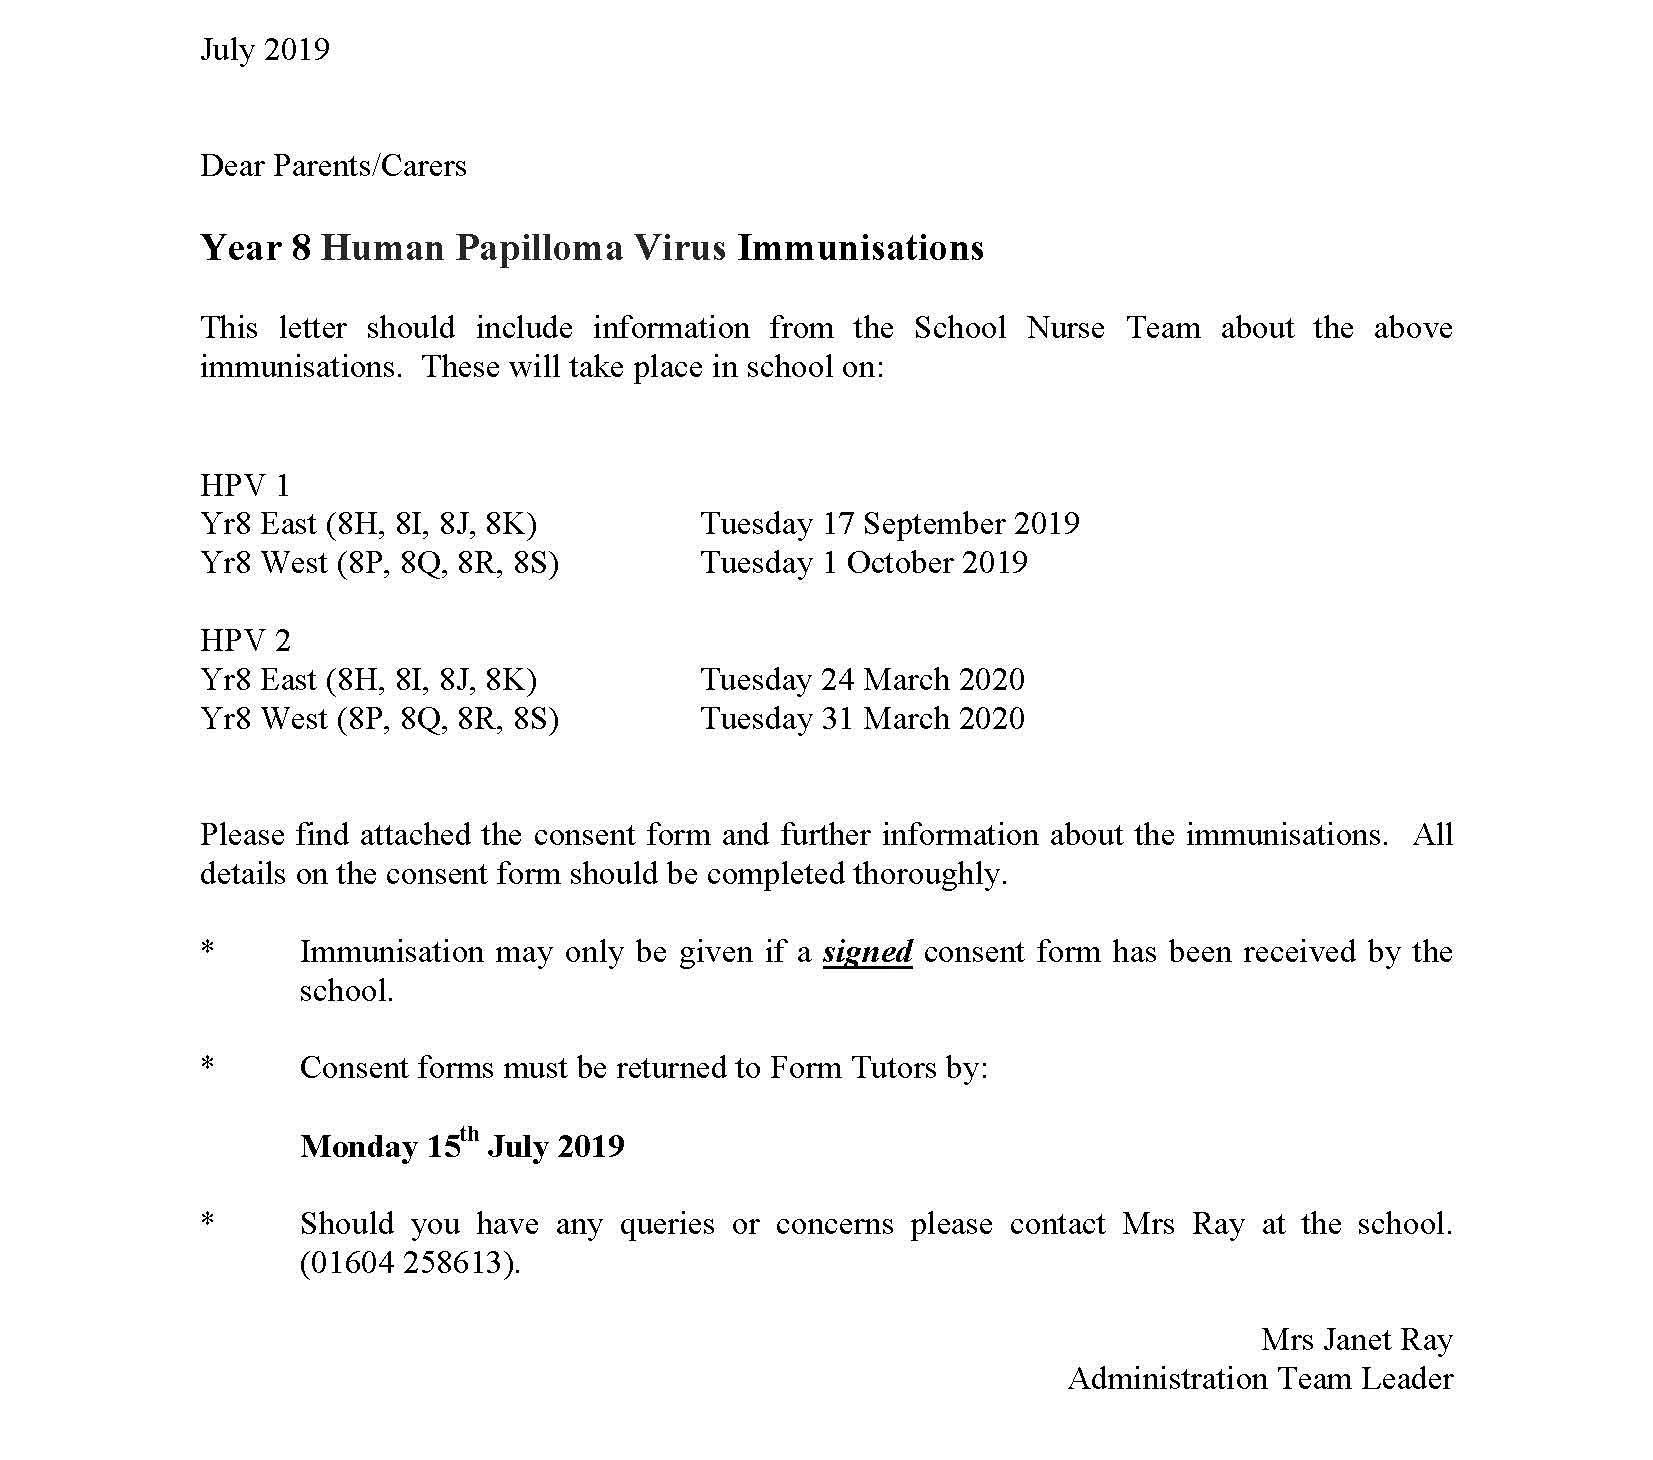 nhs hpv consent form genitali papilloma virus